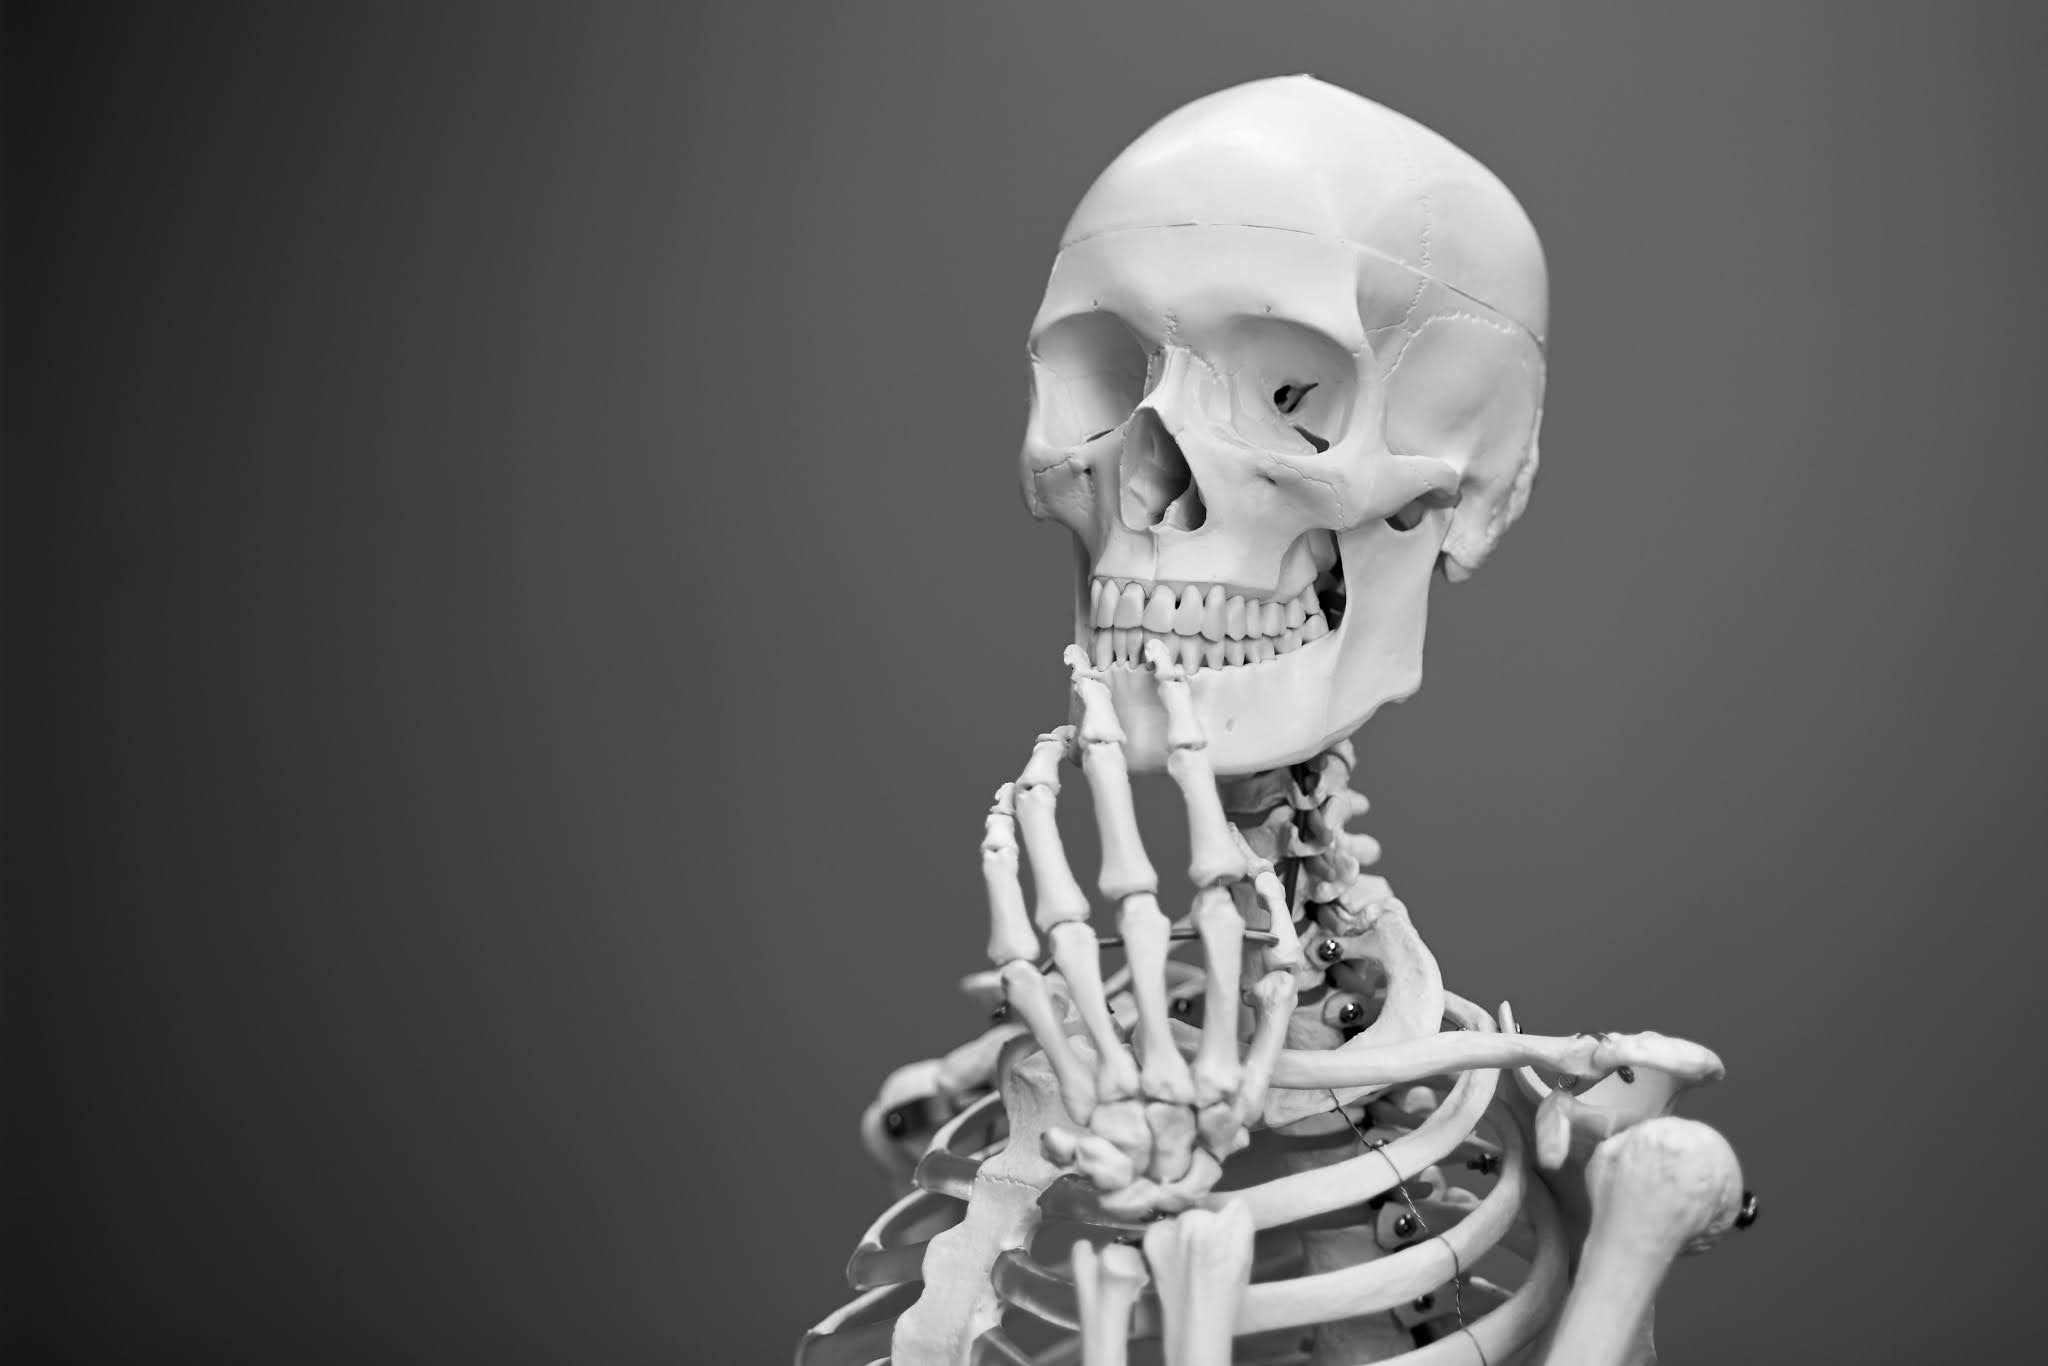 skeleton, scarcity mindset, sbc, sexperts, community, getting clients,